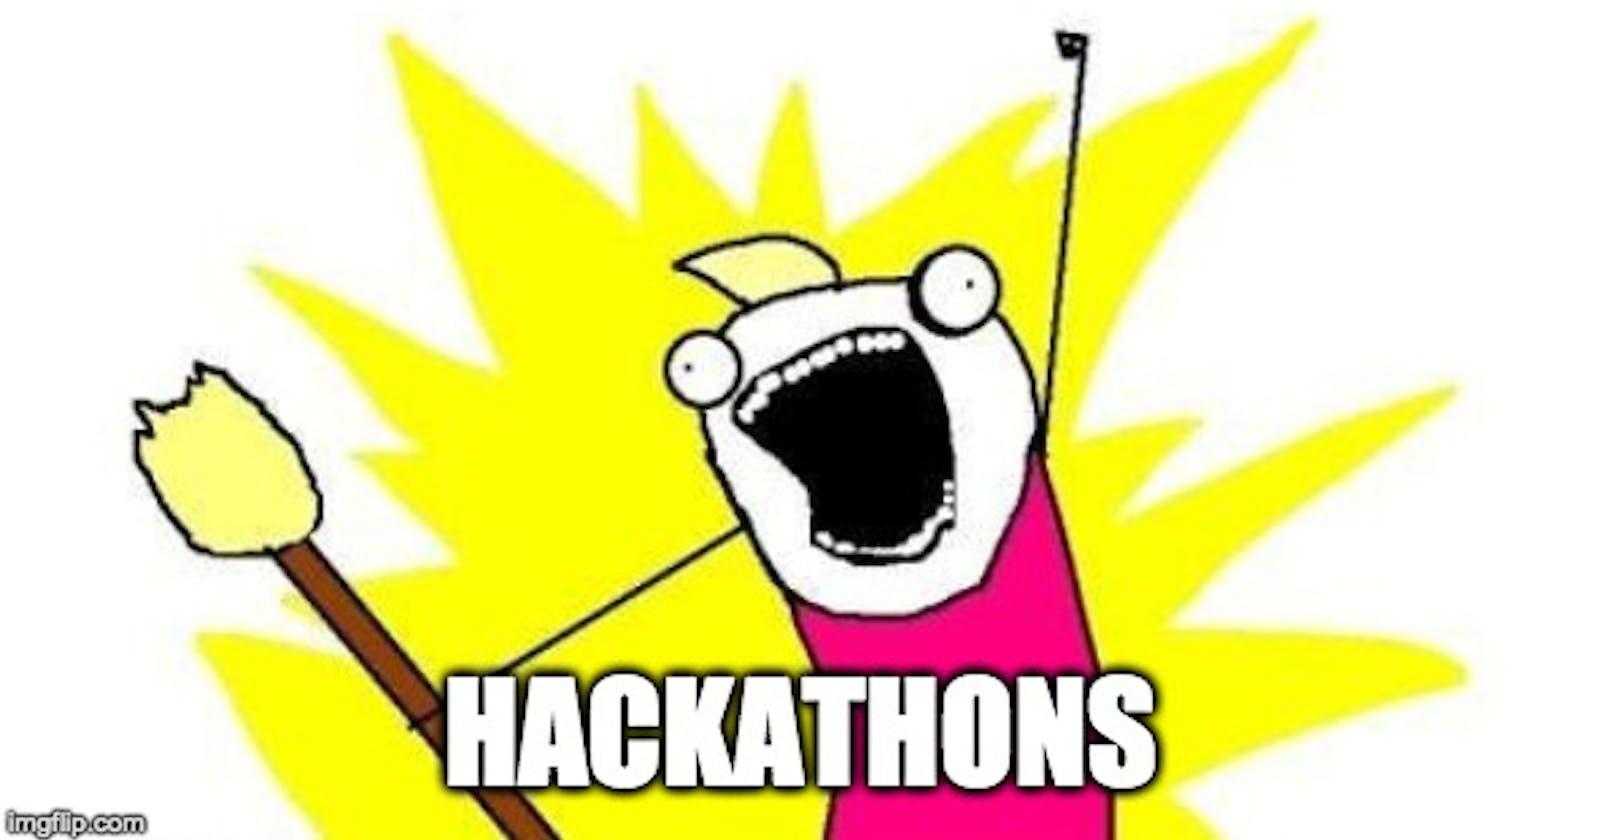 Approaching a Hackathon